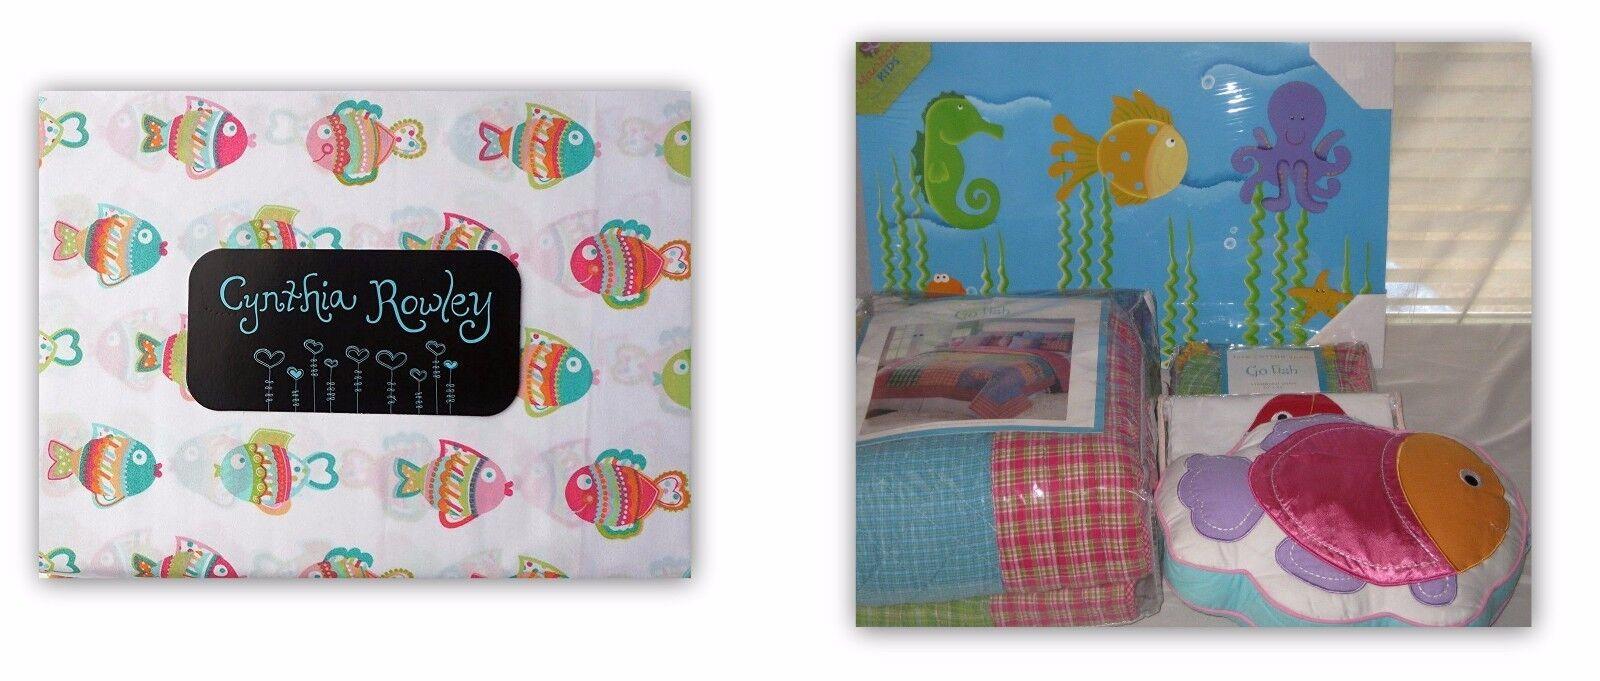 NEUF GO FISH Twin Quilt Sham Cynthia Rowley Feuille Set oreiller Cantonnière Wall Art 8PC